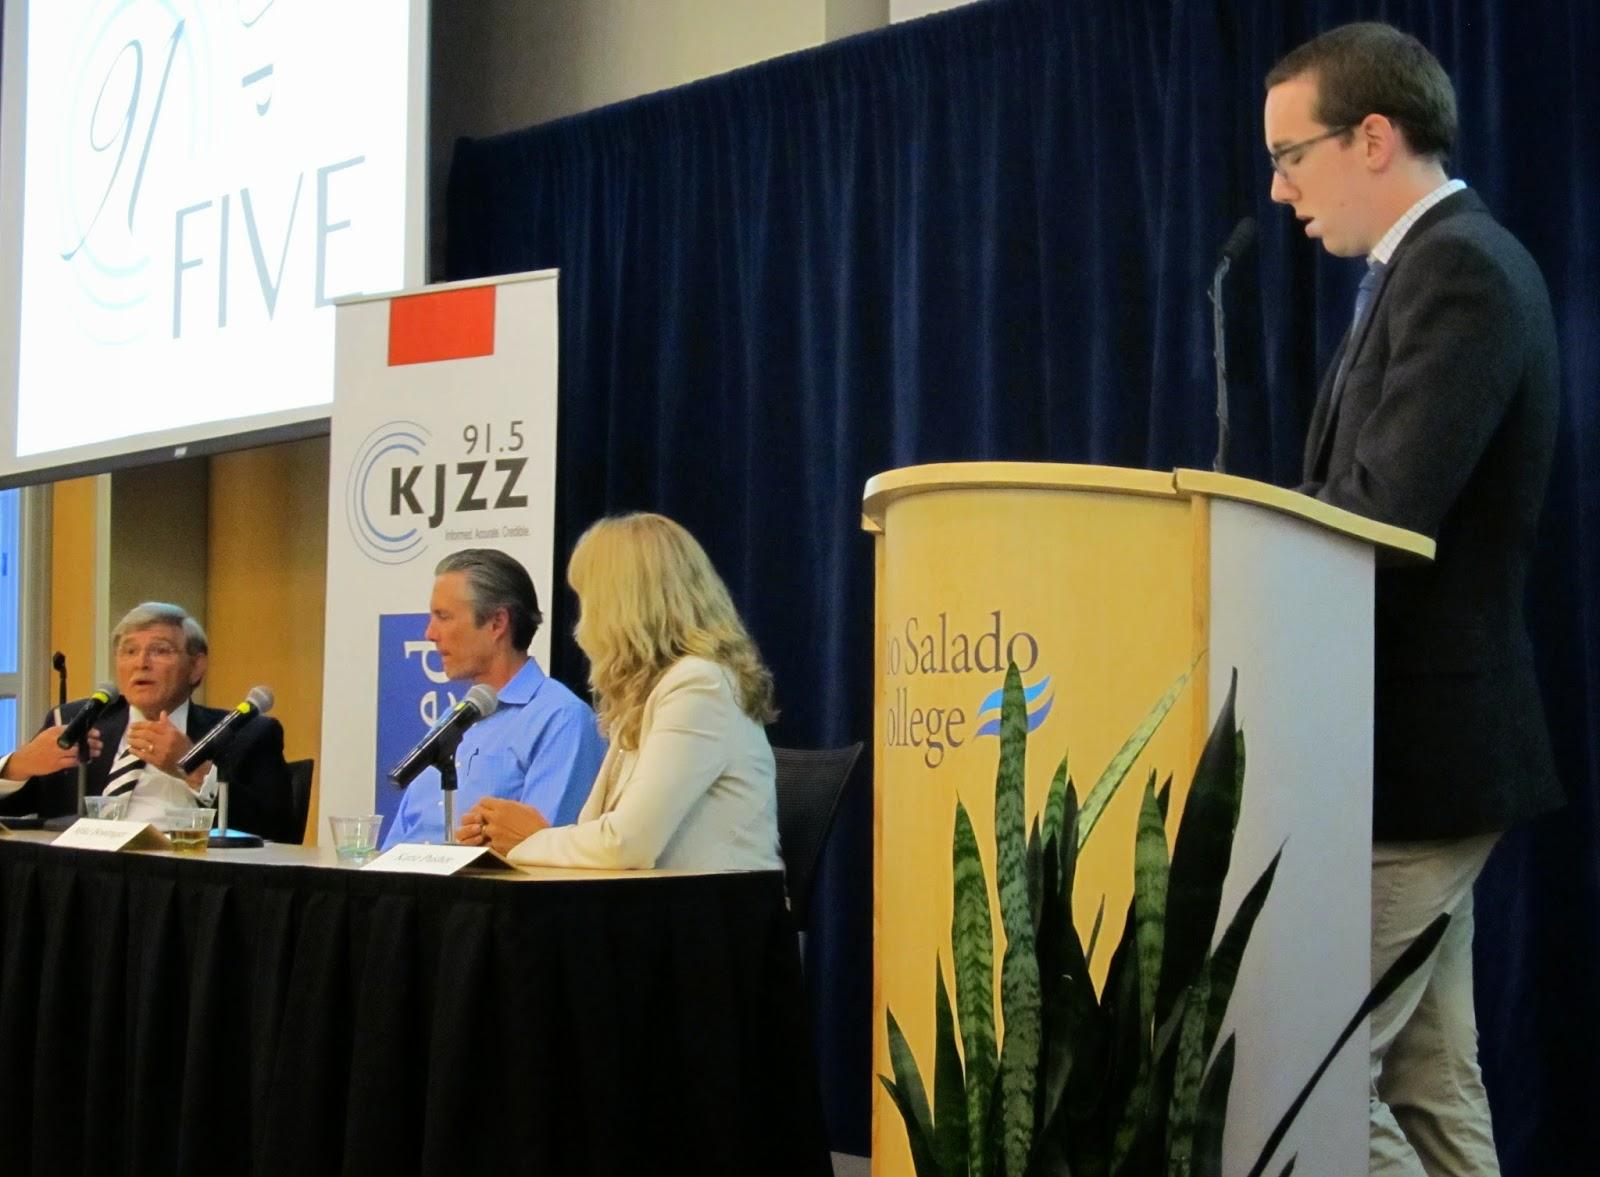 Panel discussion at Rio Salado Conference Center